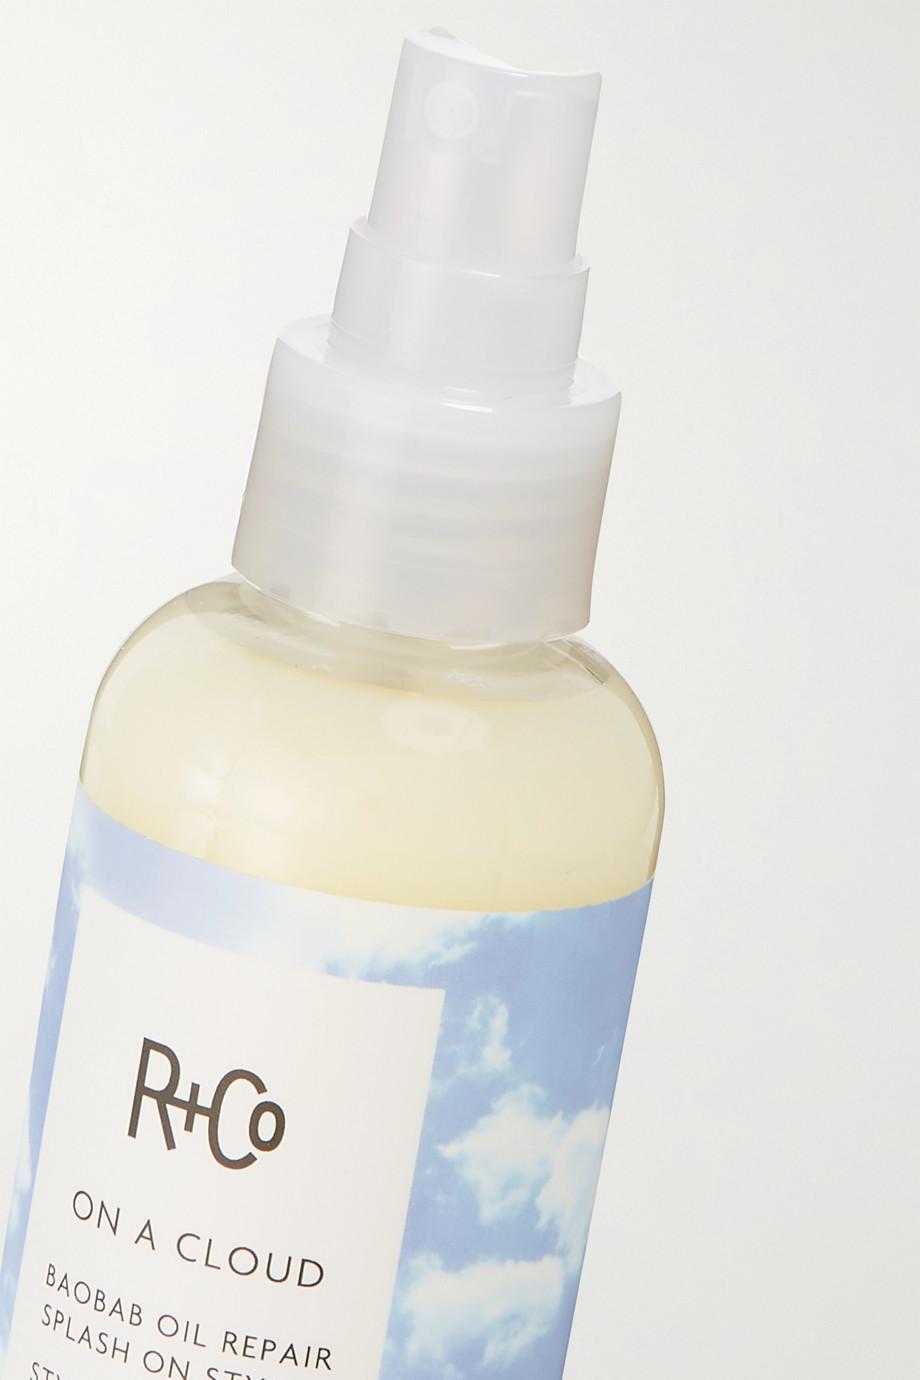 R+Co On a Cloud Baobab Oil Repair Splash-On Styler, 124 ml – Stylingspray